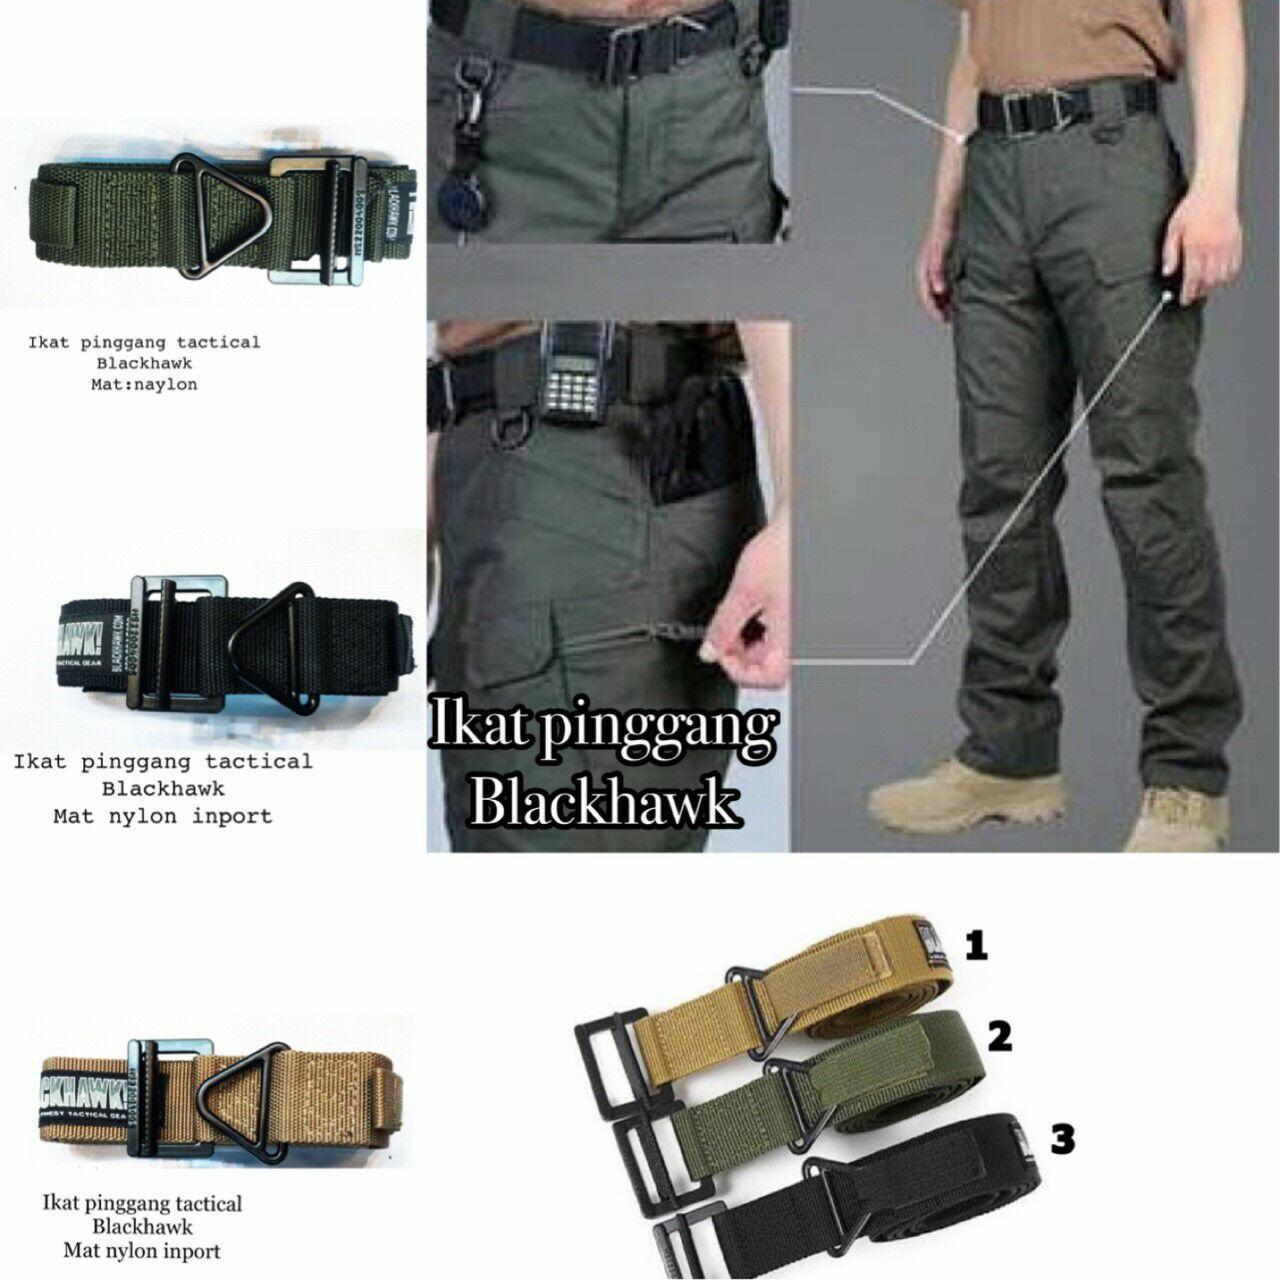 Blackhawk tactical kopel ikat pinggang gesper sabuk belt tactical series army outdoor adventure